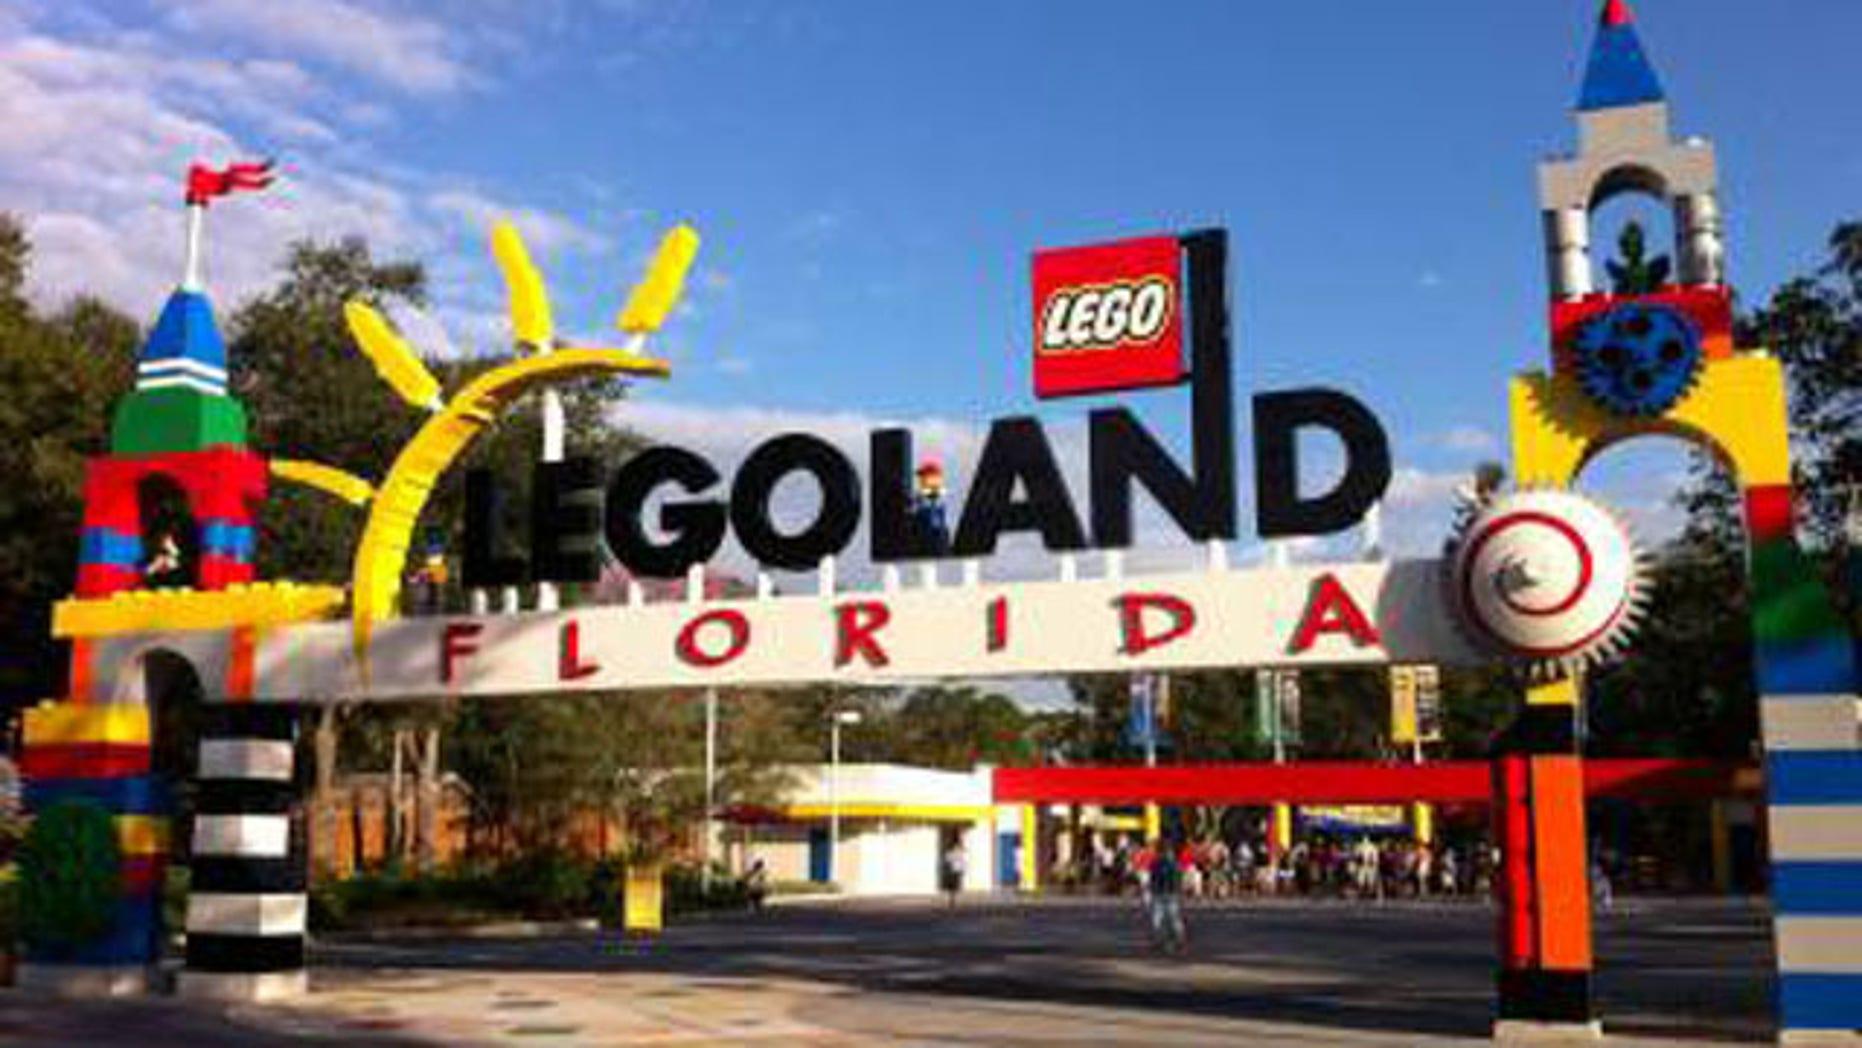 The front gates at Legoland Florida.